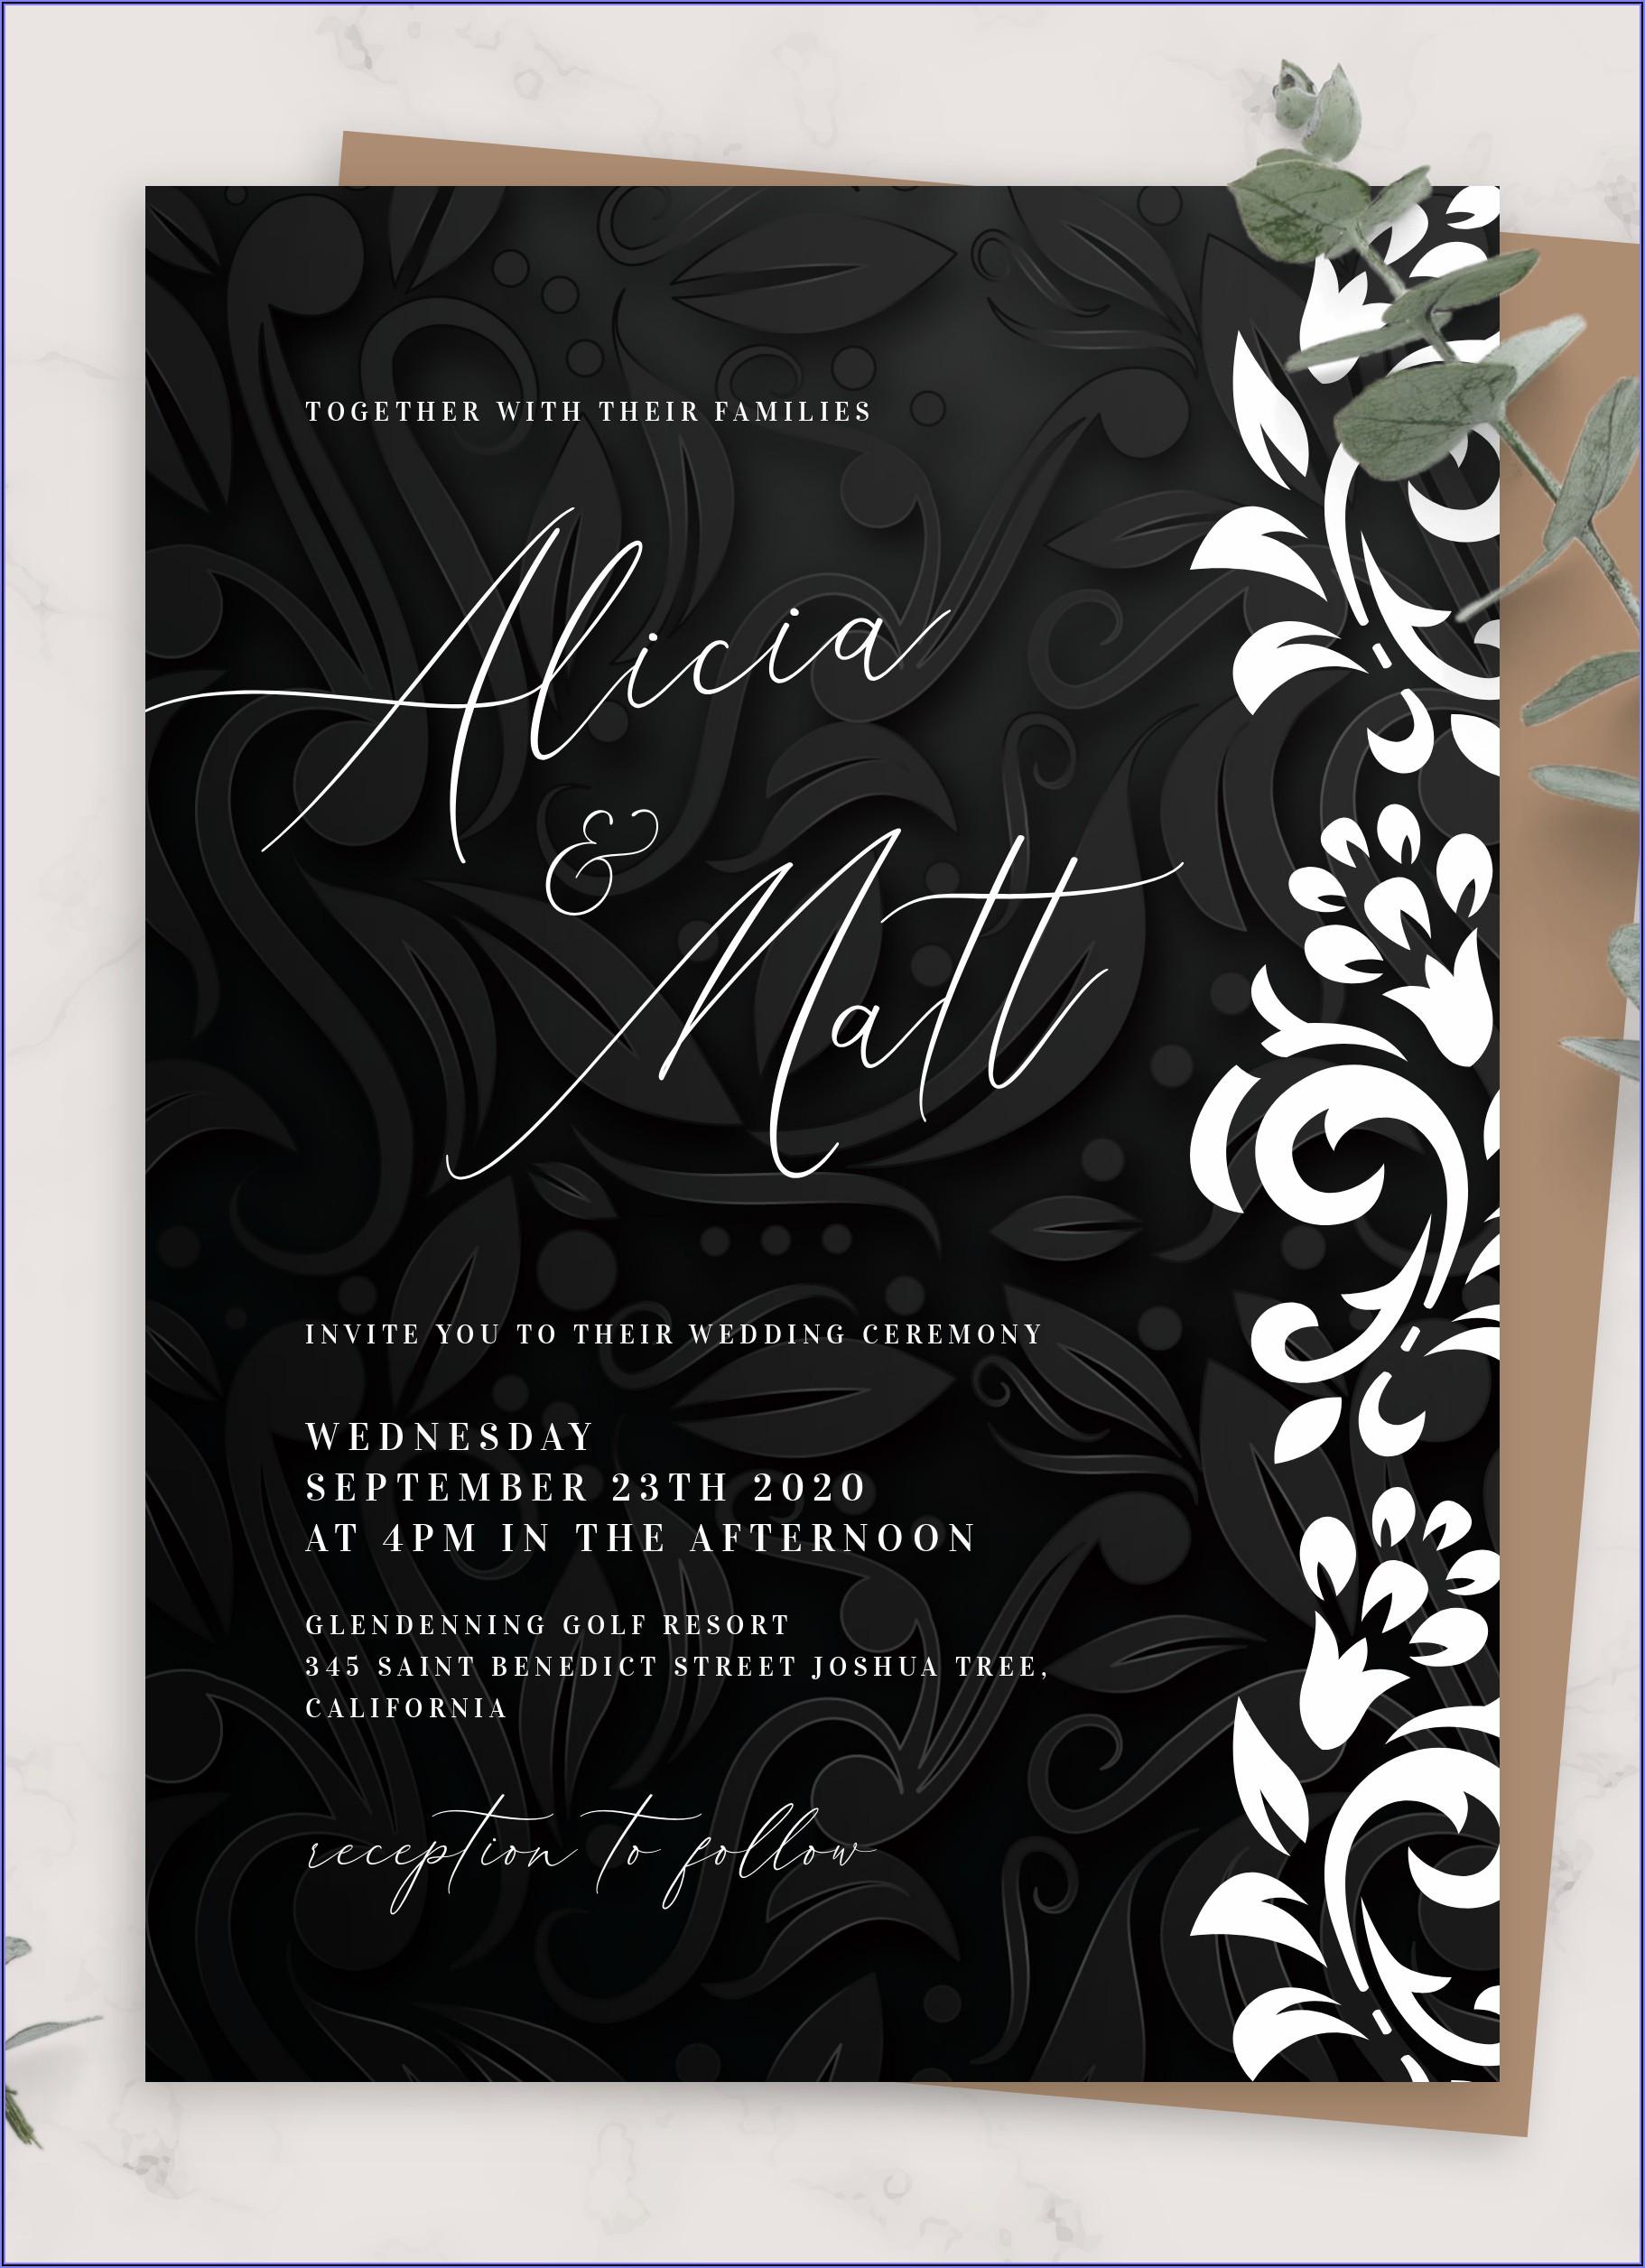 Wedding Invitation Background Black And White